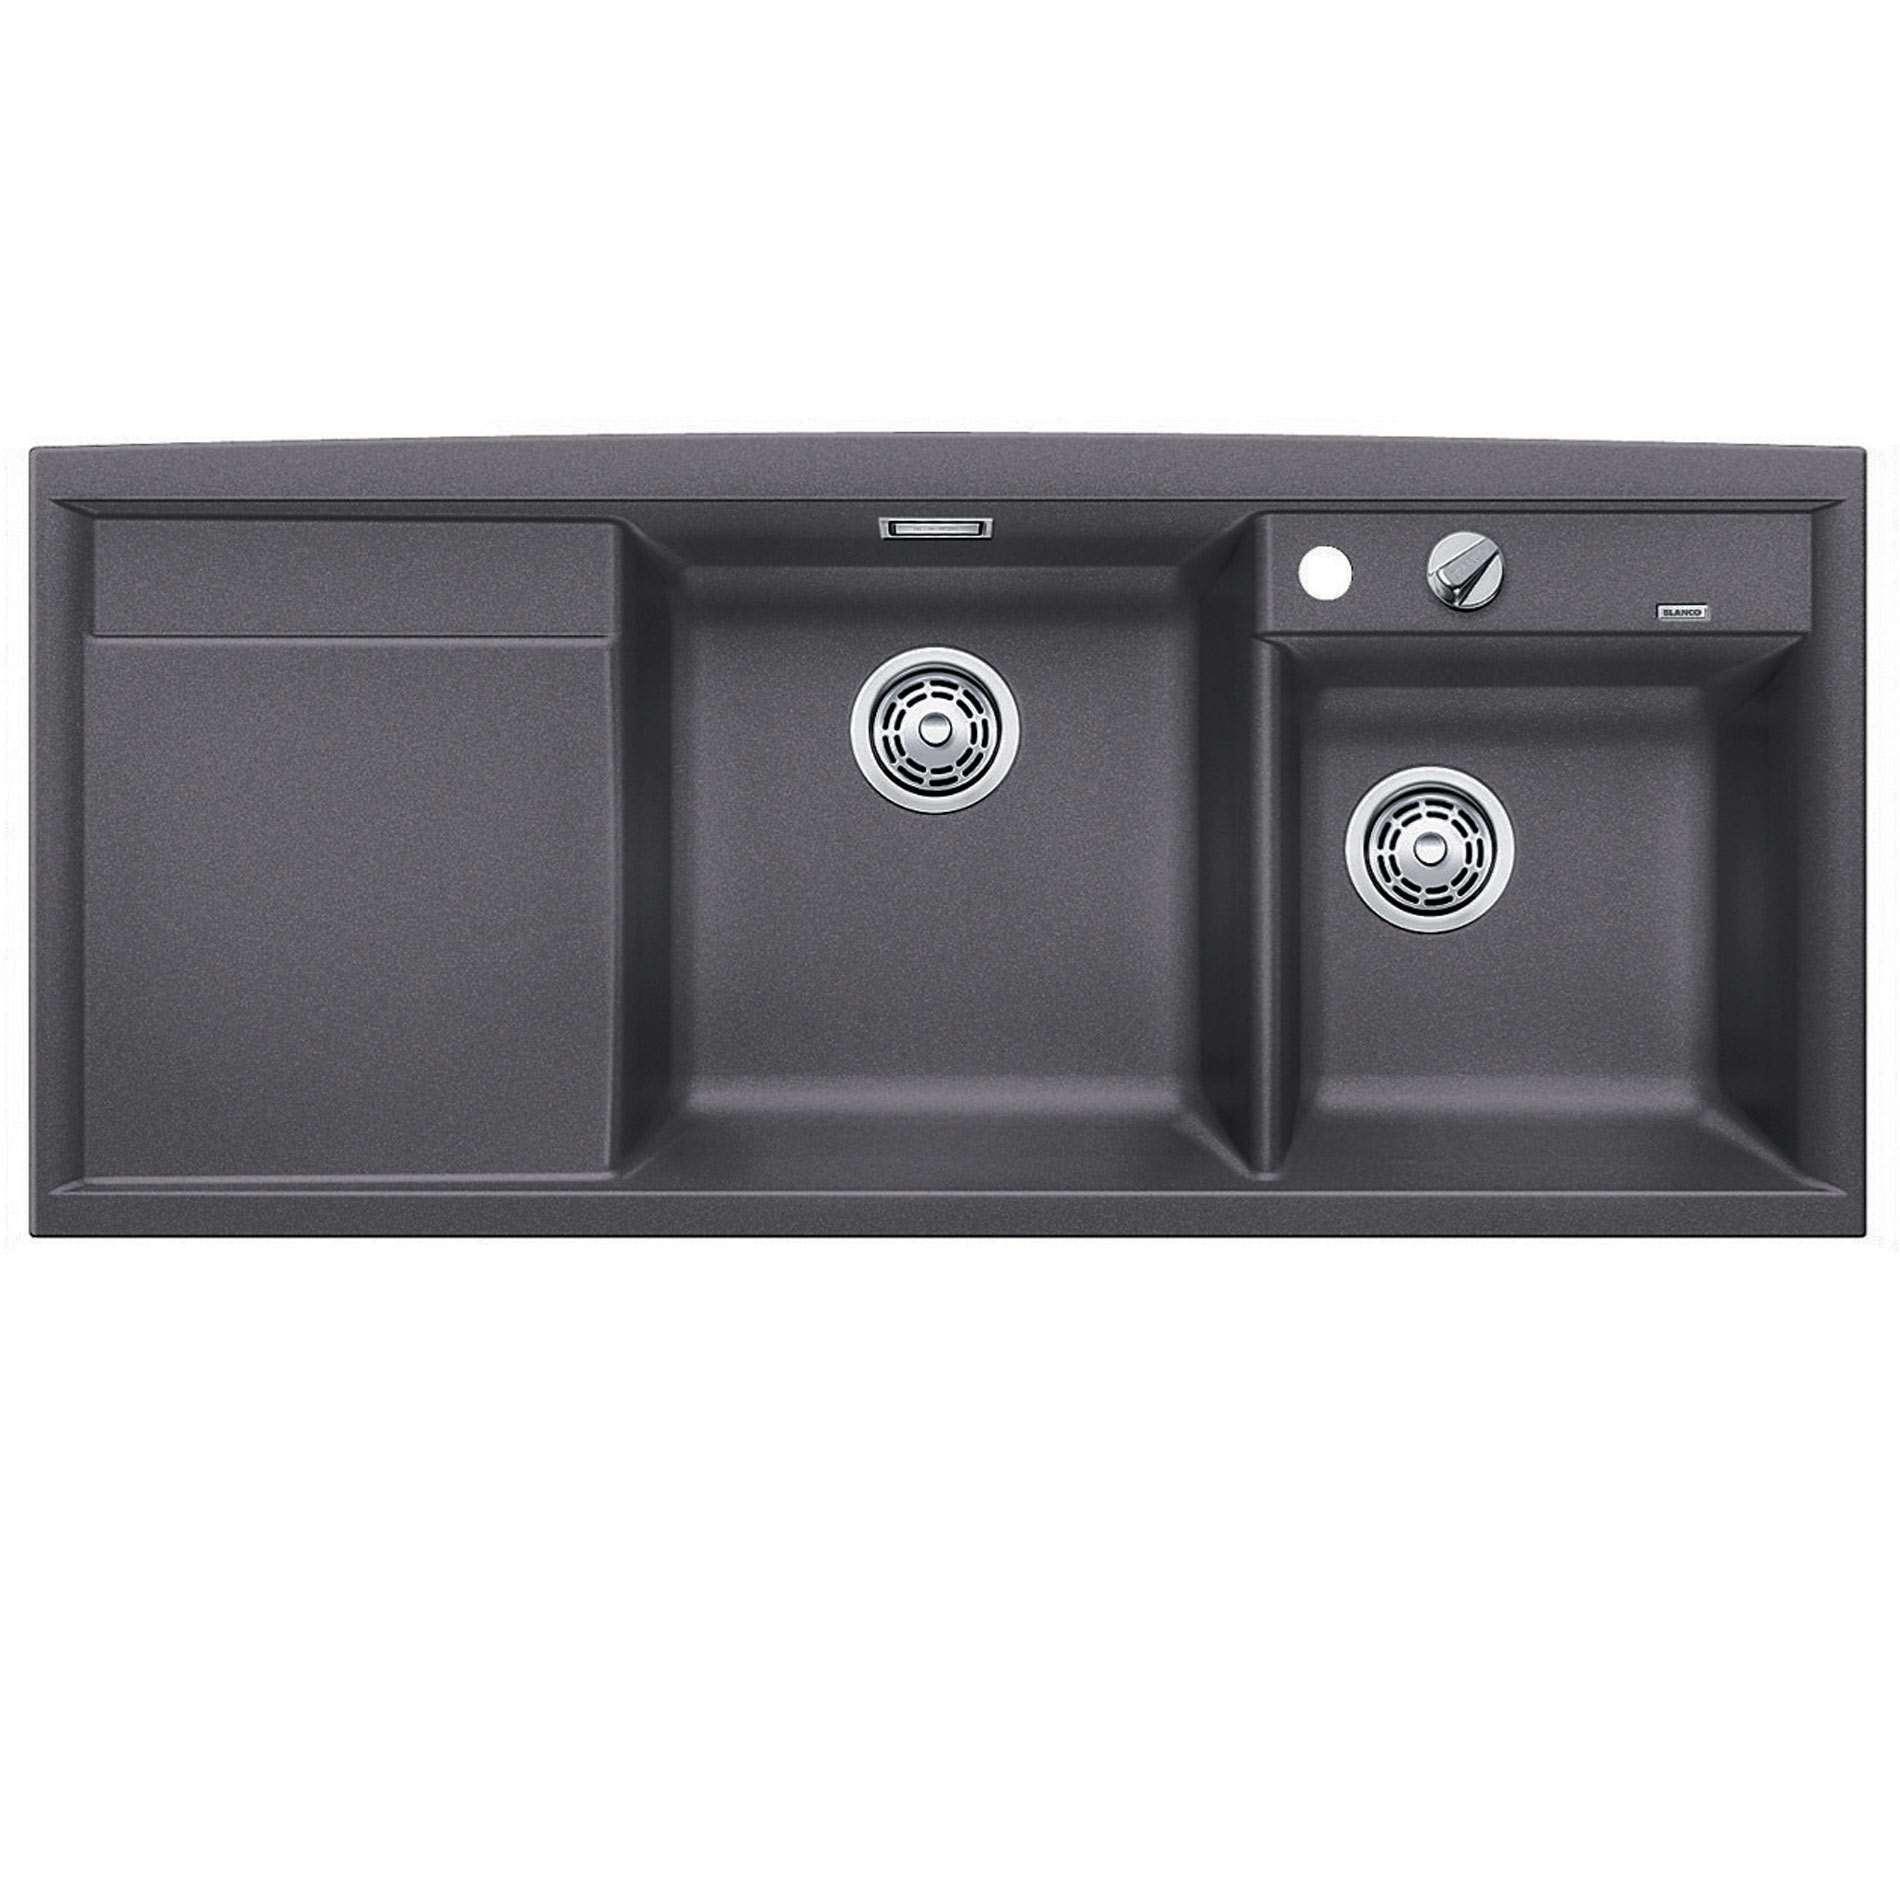 Blanco Grey Sink : Blanco: Axia II 8 S Rock Grey Silgranit Sink - Kitchen Sinks & Taps